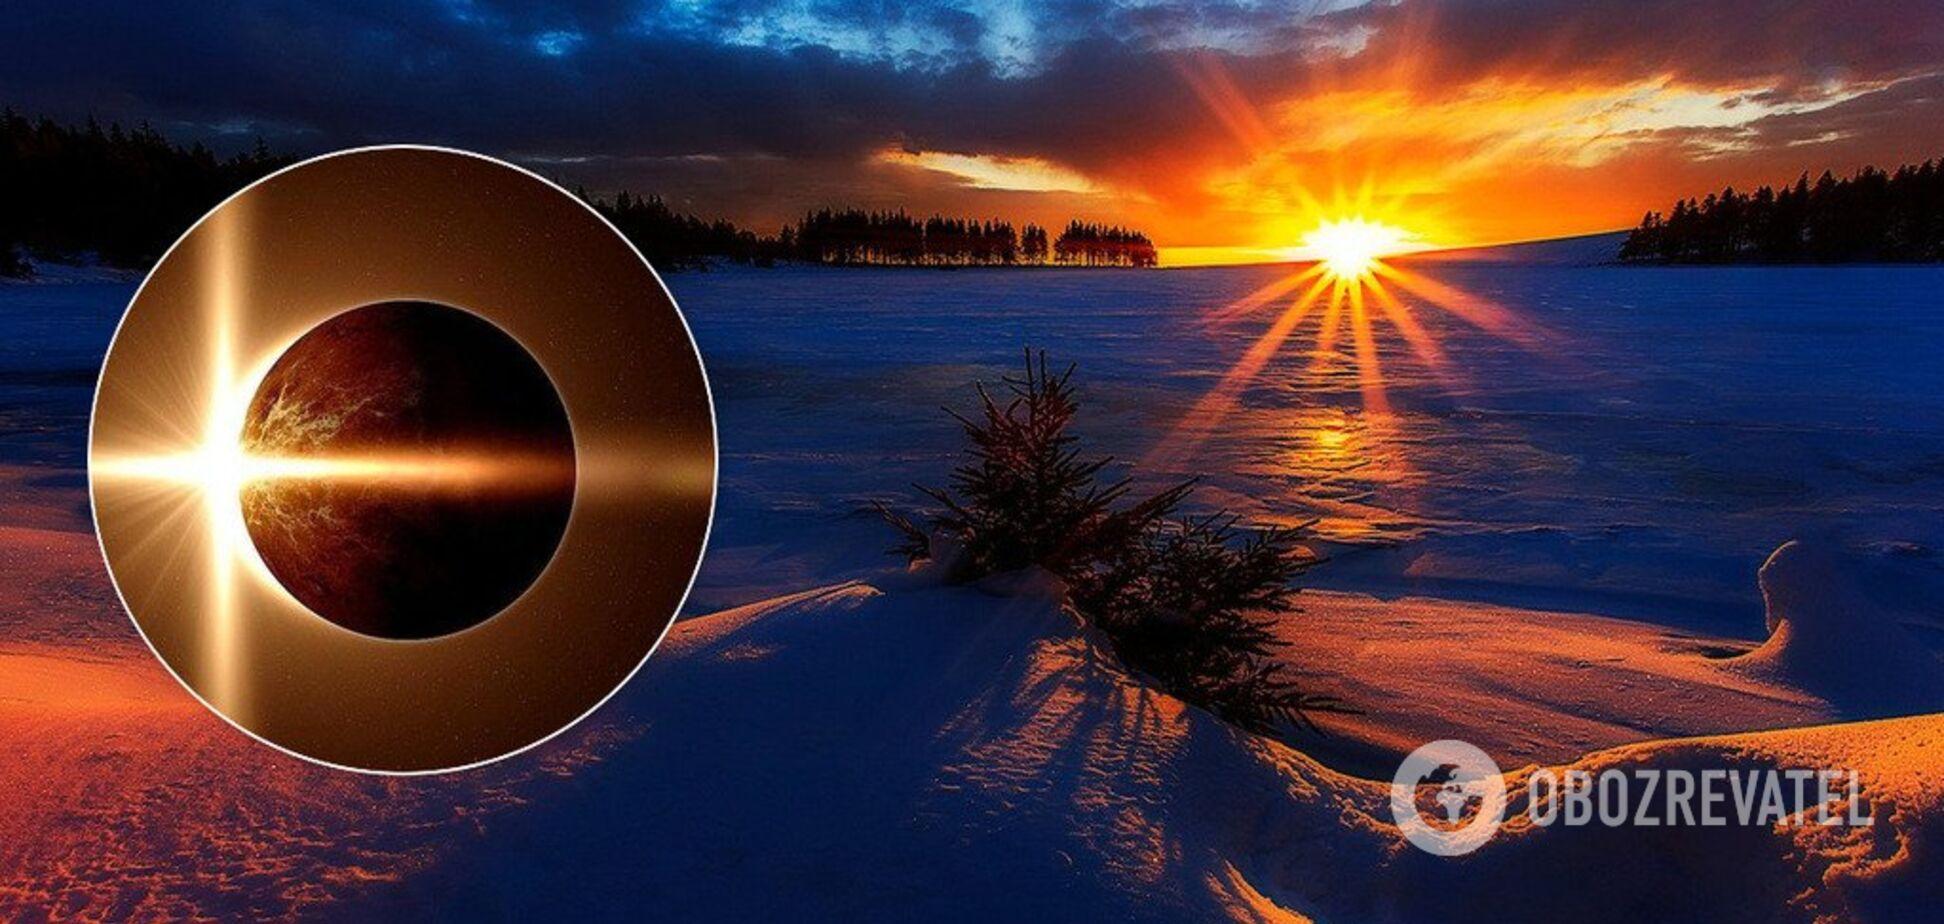 Затемнення 26 грудня: астрологиня пояснила, чого категорично не можна робити